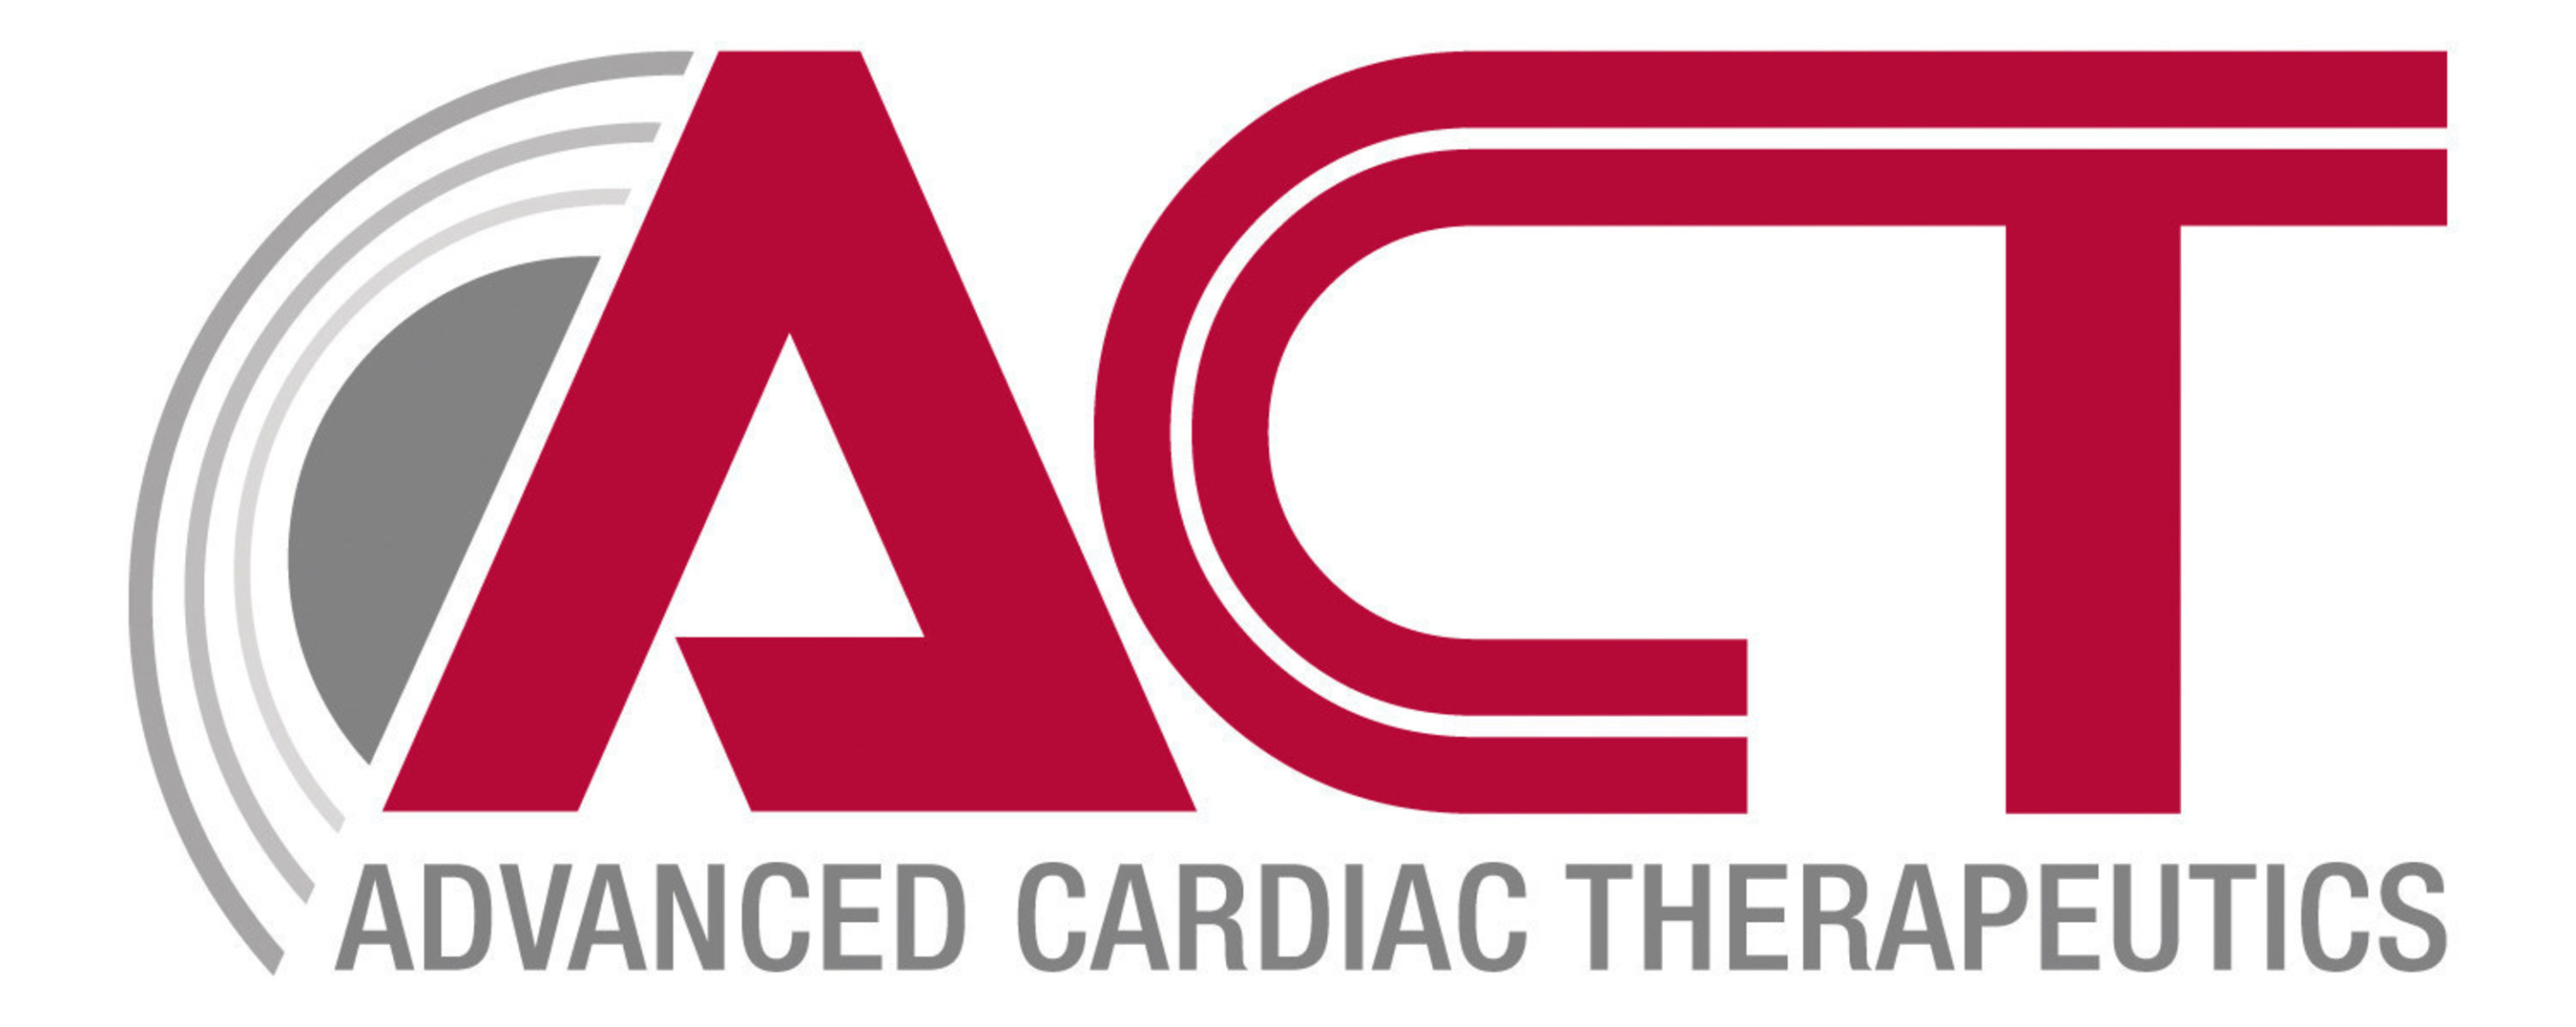 Advanced Cardiac Therapeutics Logo. www.actmed.net